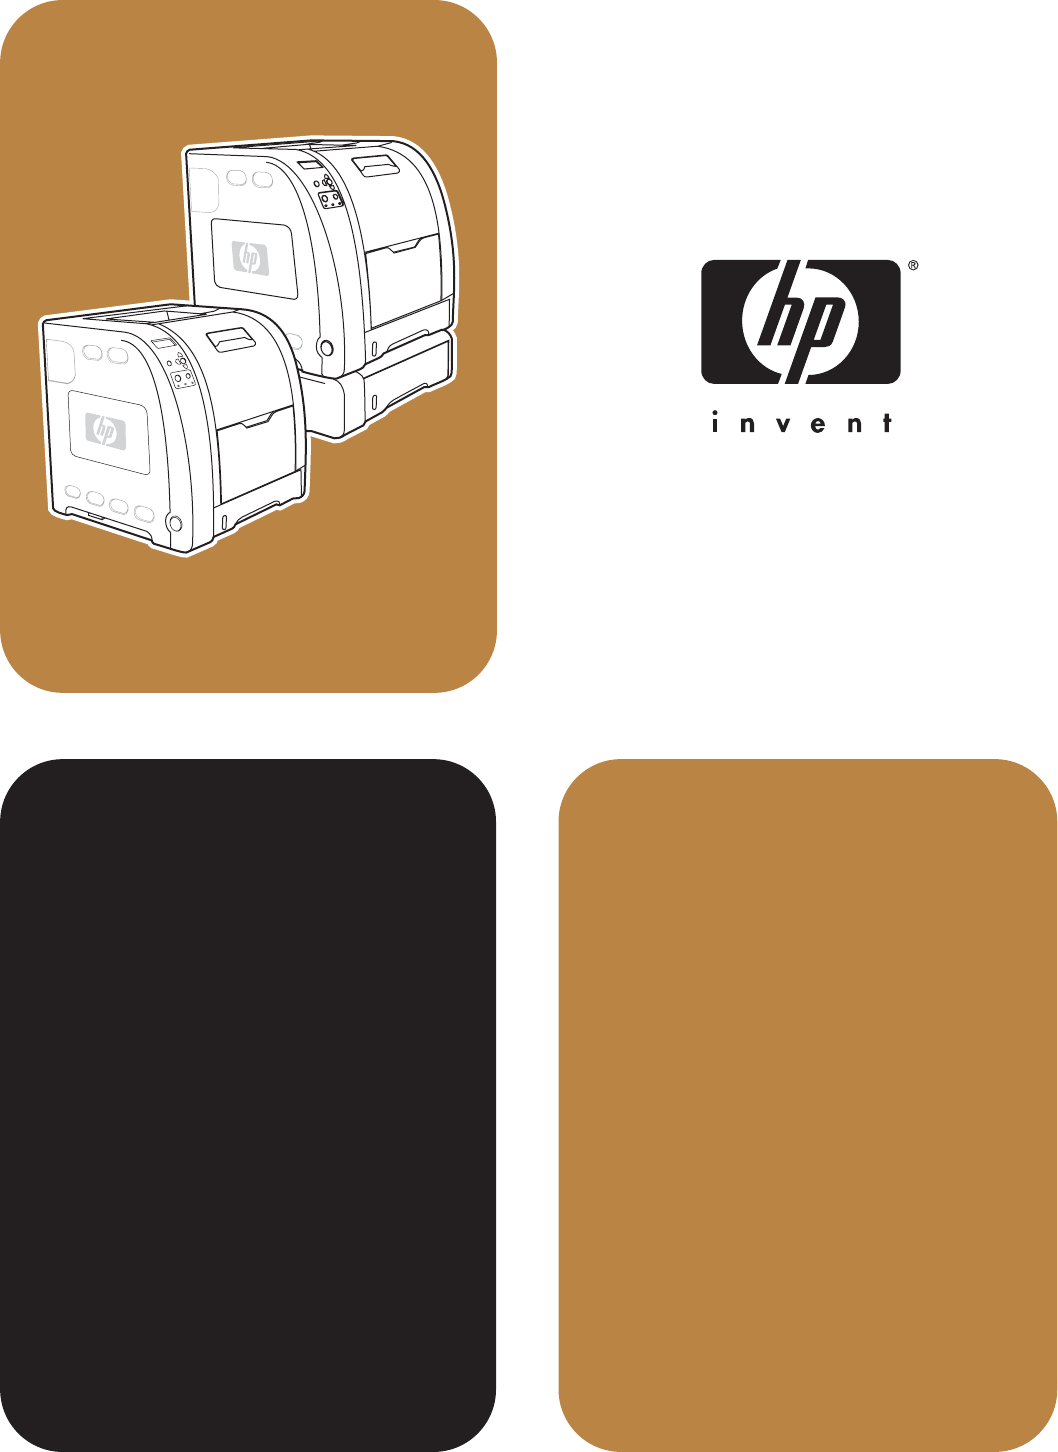 hp color laserjet 3500 3550 and 3700 series printers service manual rh dectrader com roland hp 3700 service manual roland hp 3700 manual